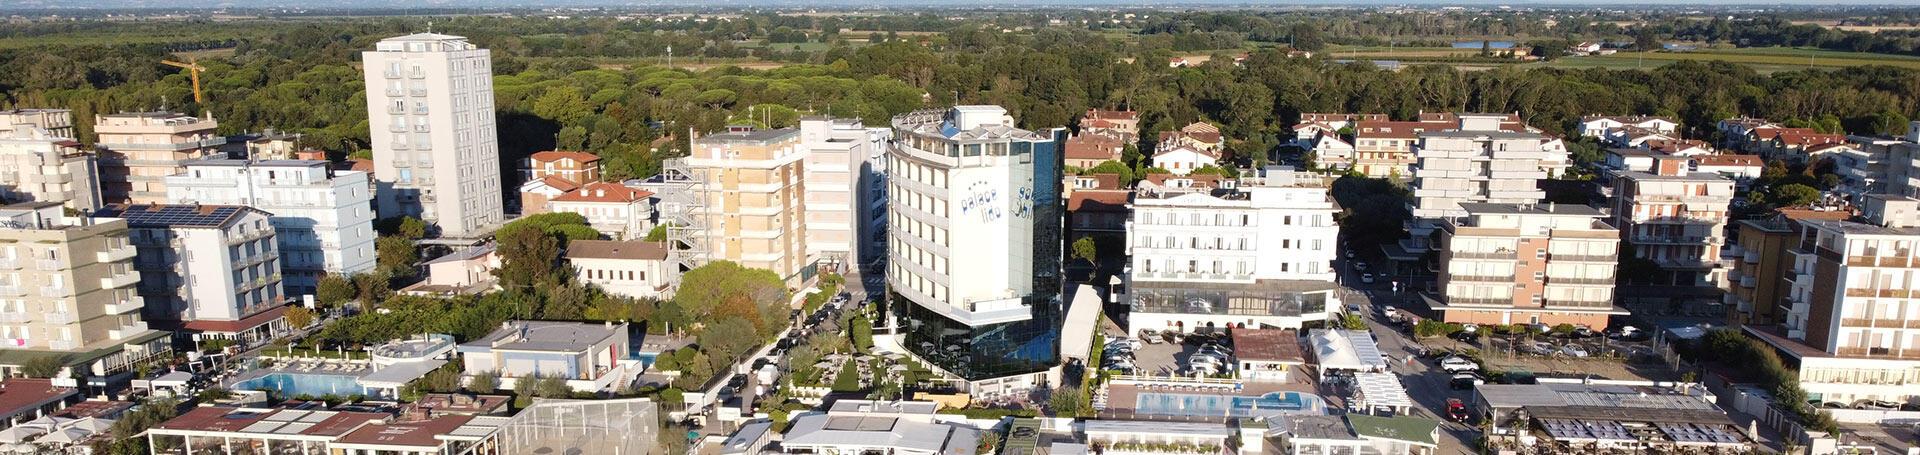 palacelidohotel fr position 011